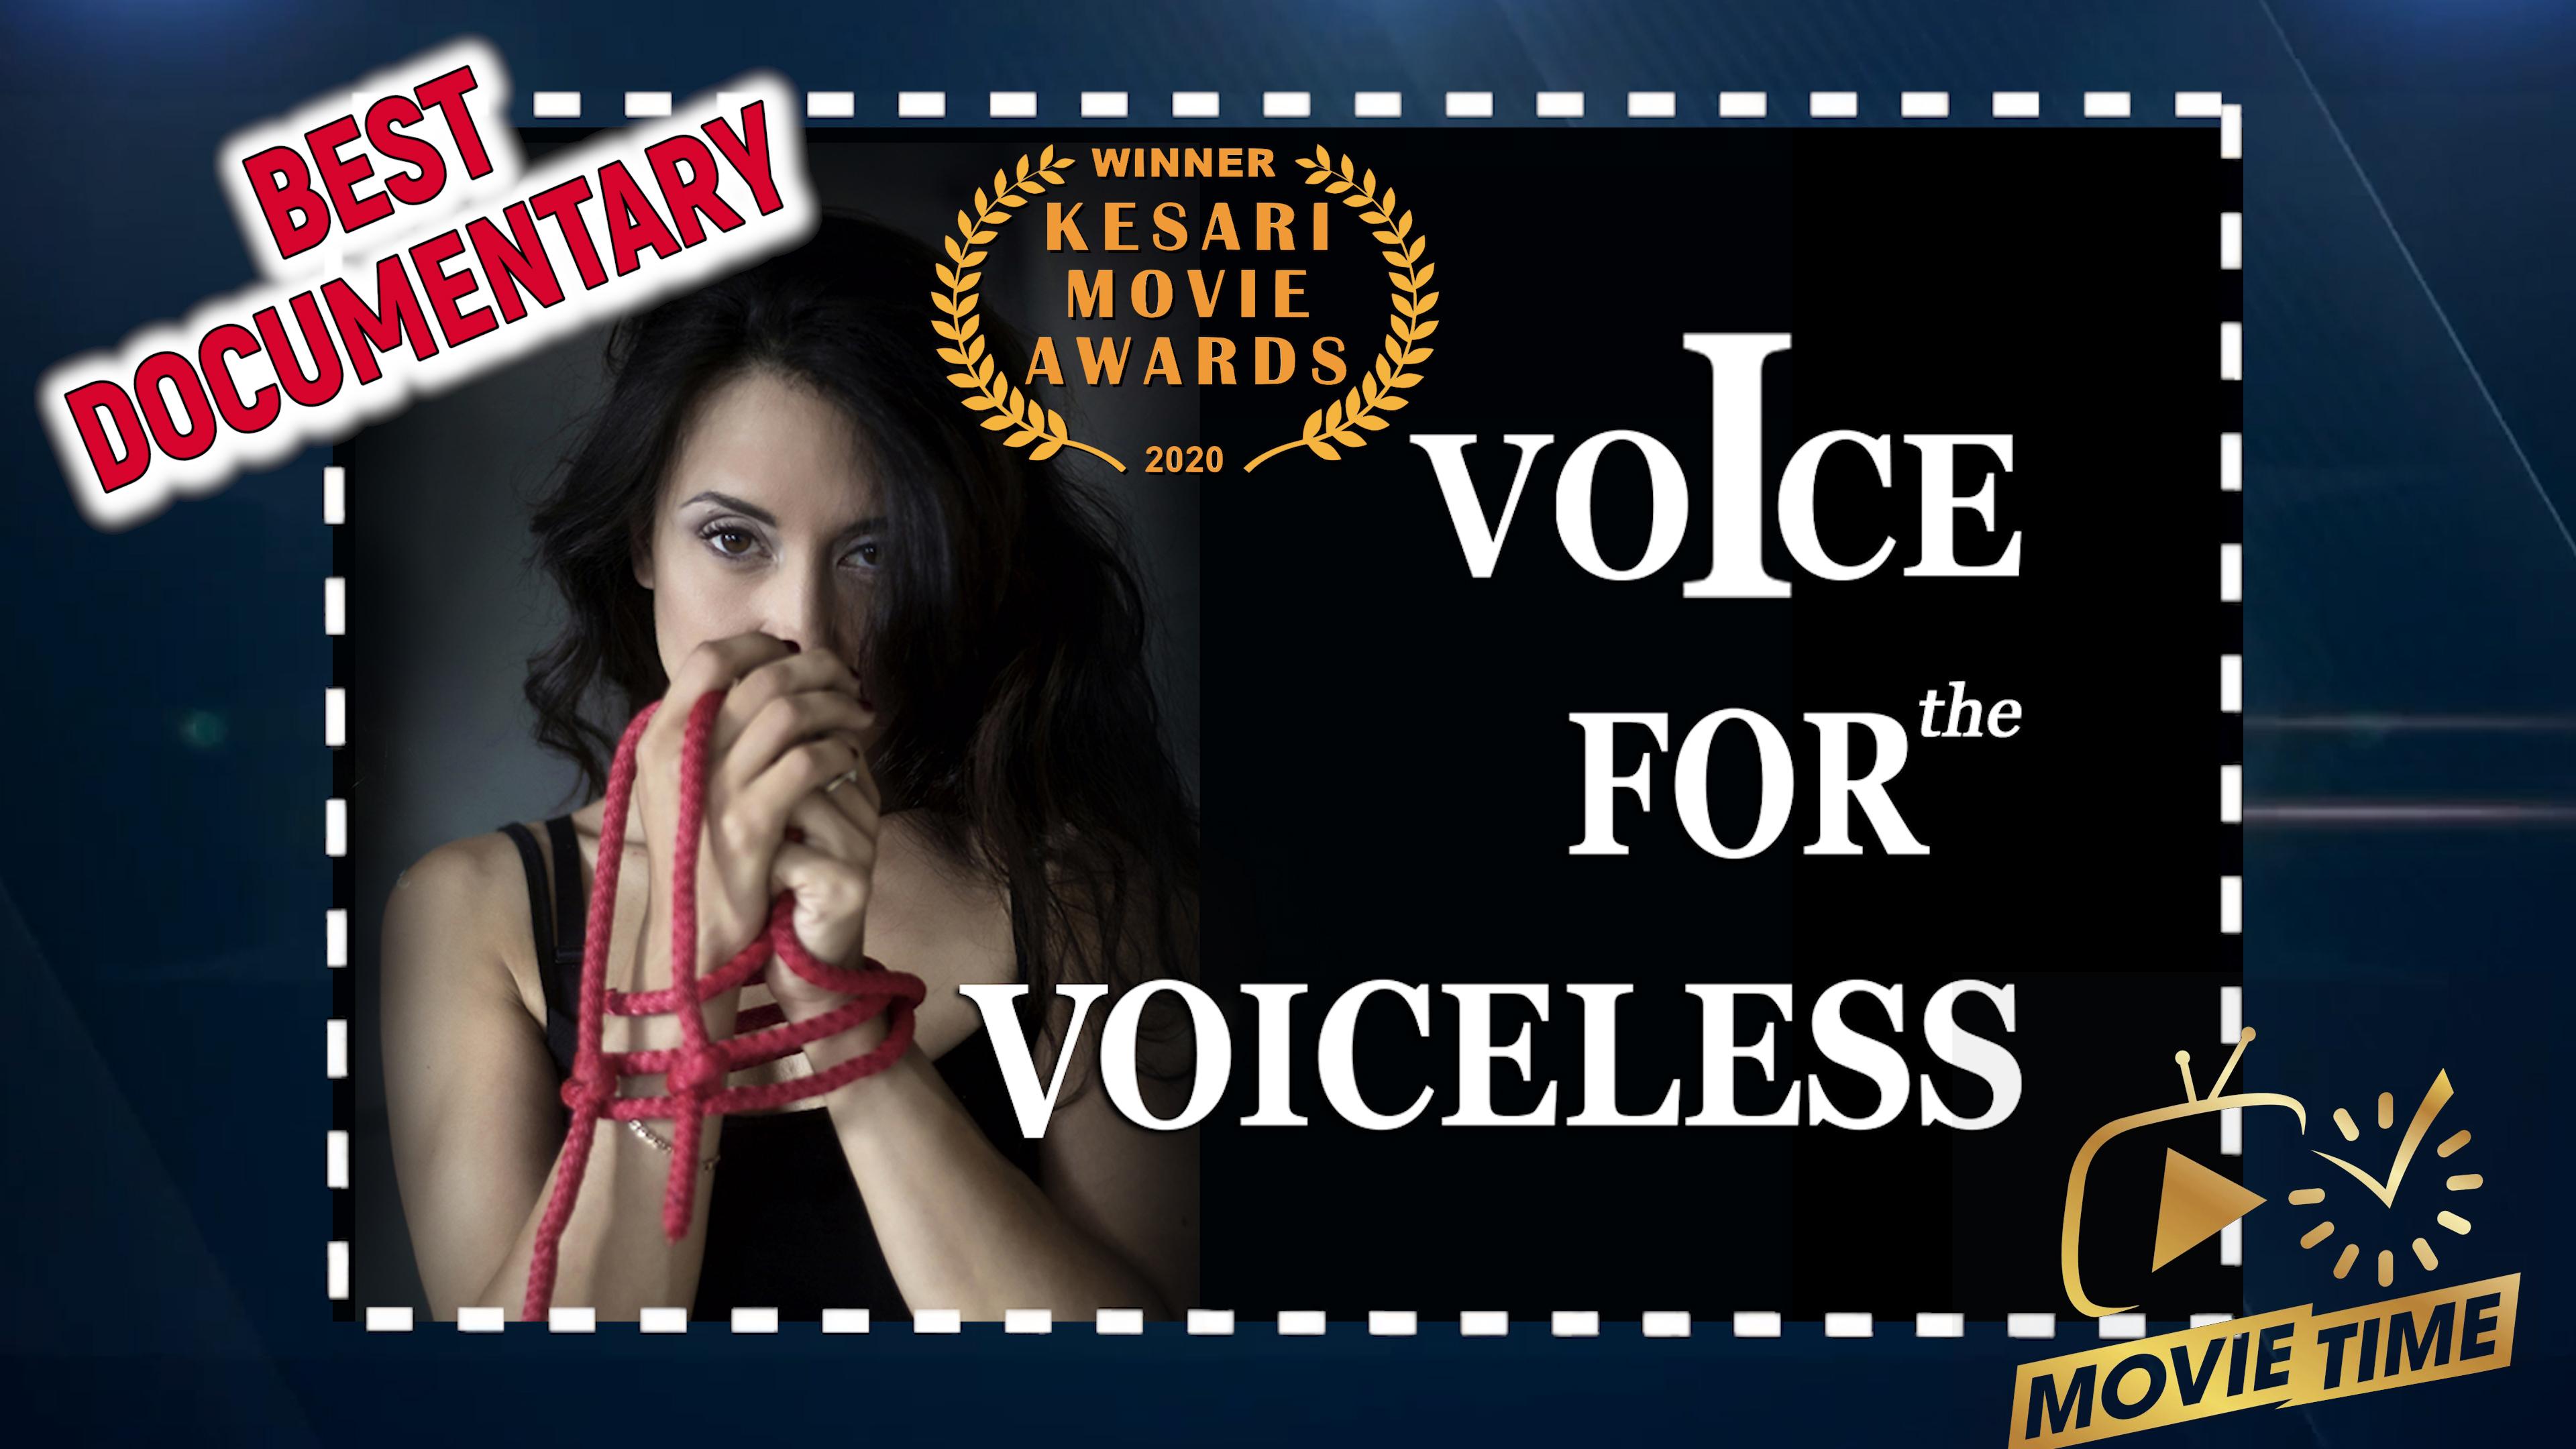 Voice for the Voiceless — WON🏆| Kesari Movie Awards